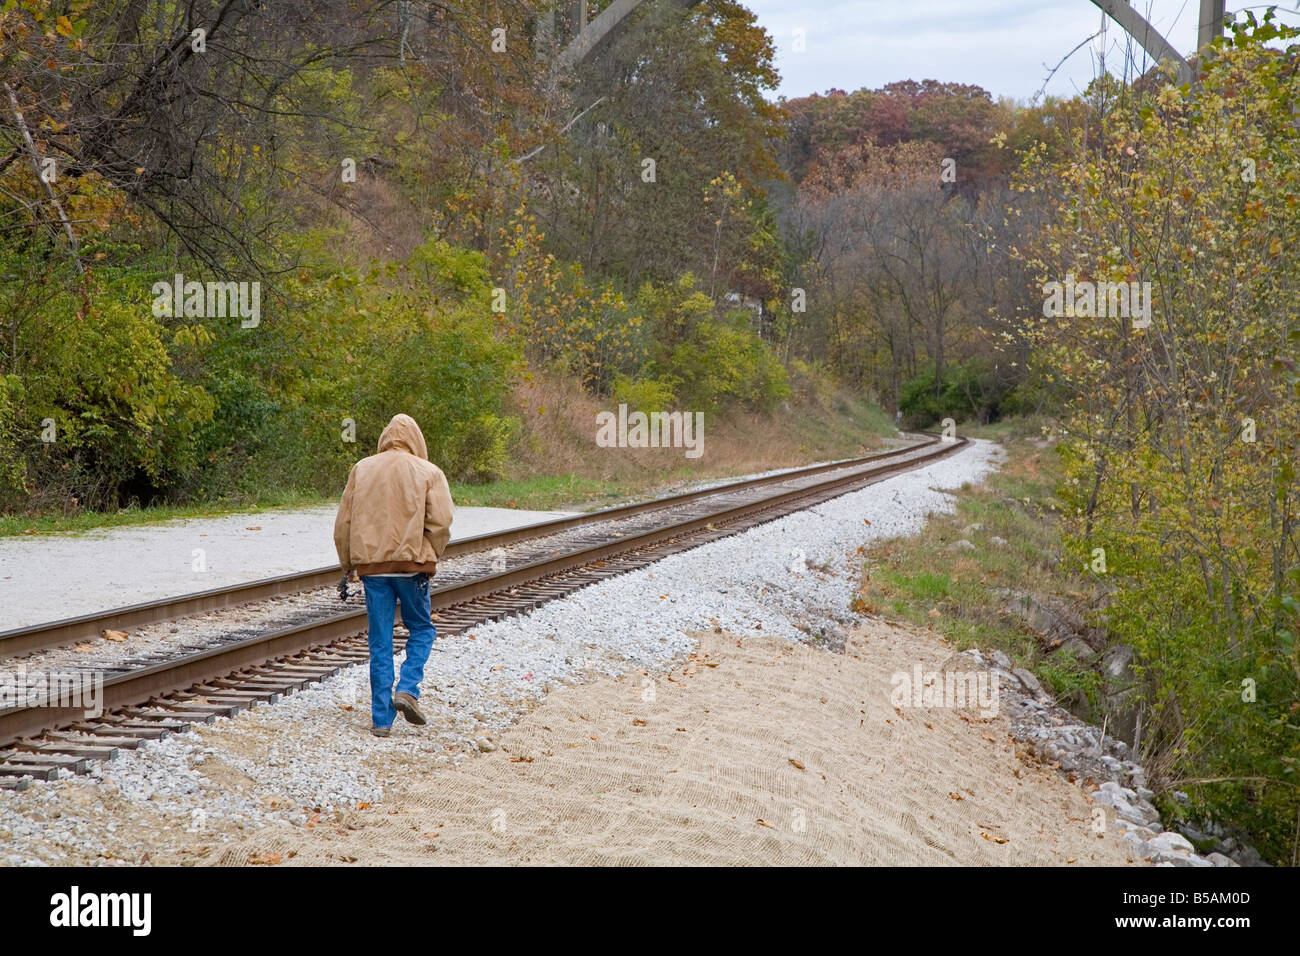 Man Walks Along Railroad Tracks - Stock Image